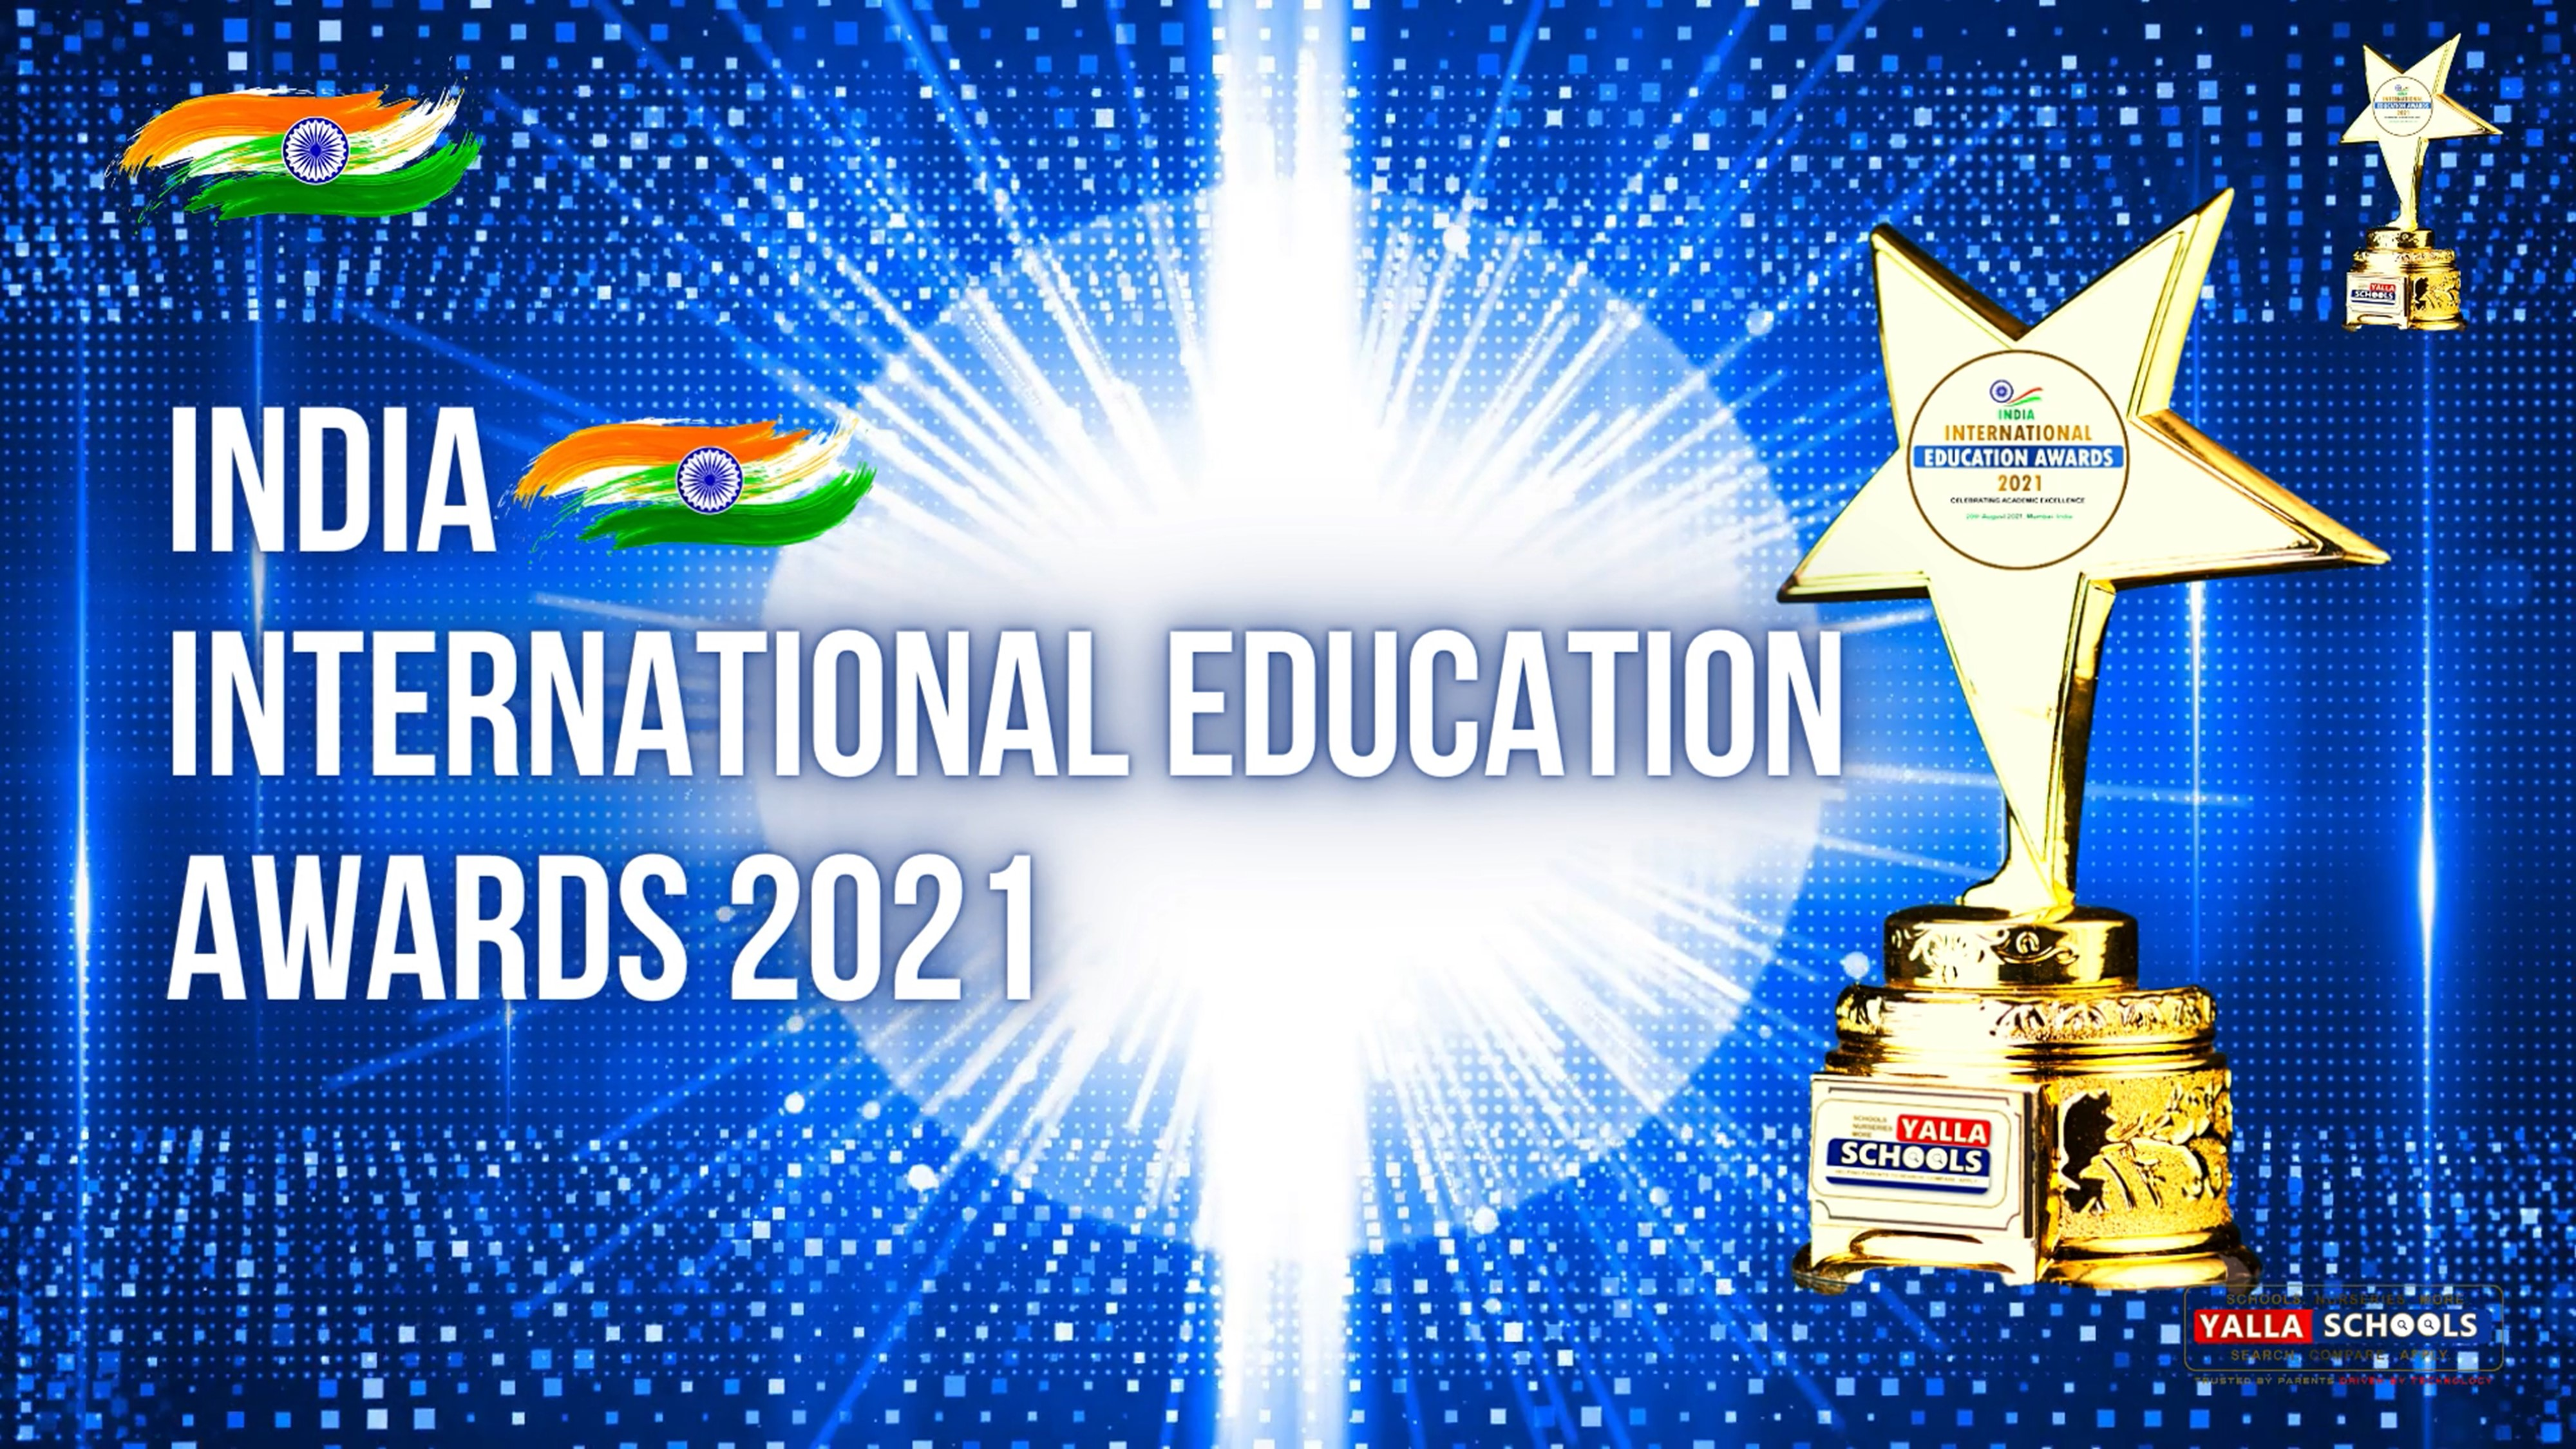 India_International_Education_Awards_2021_-_Invitation1